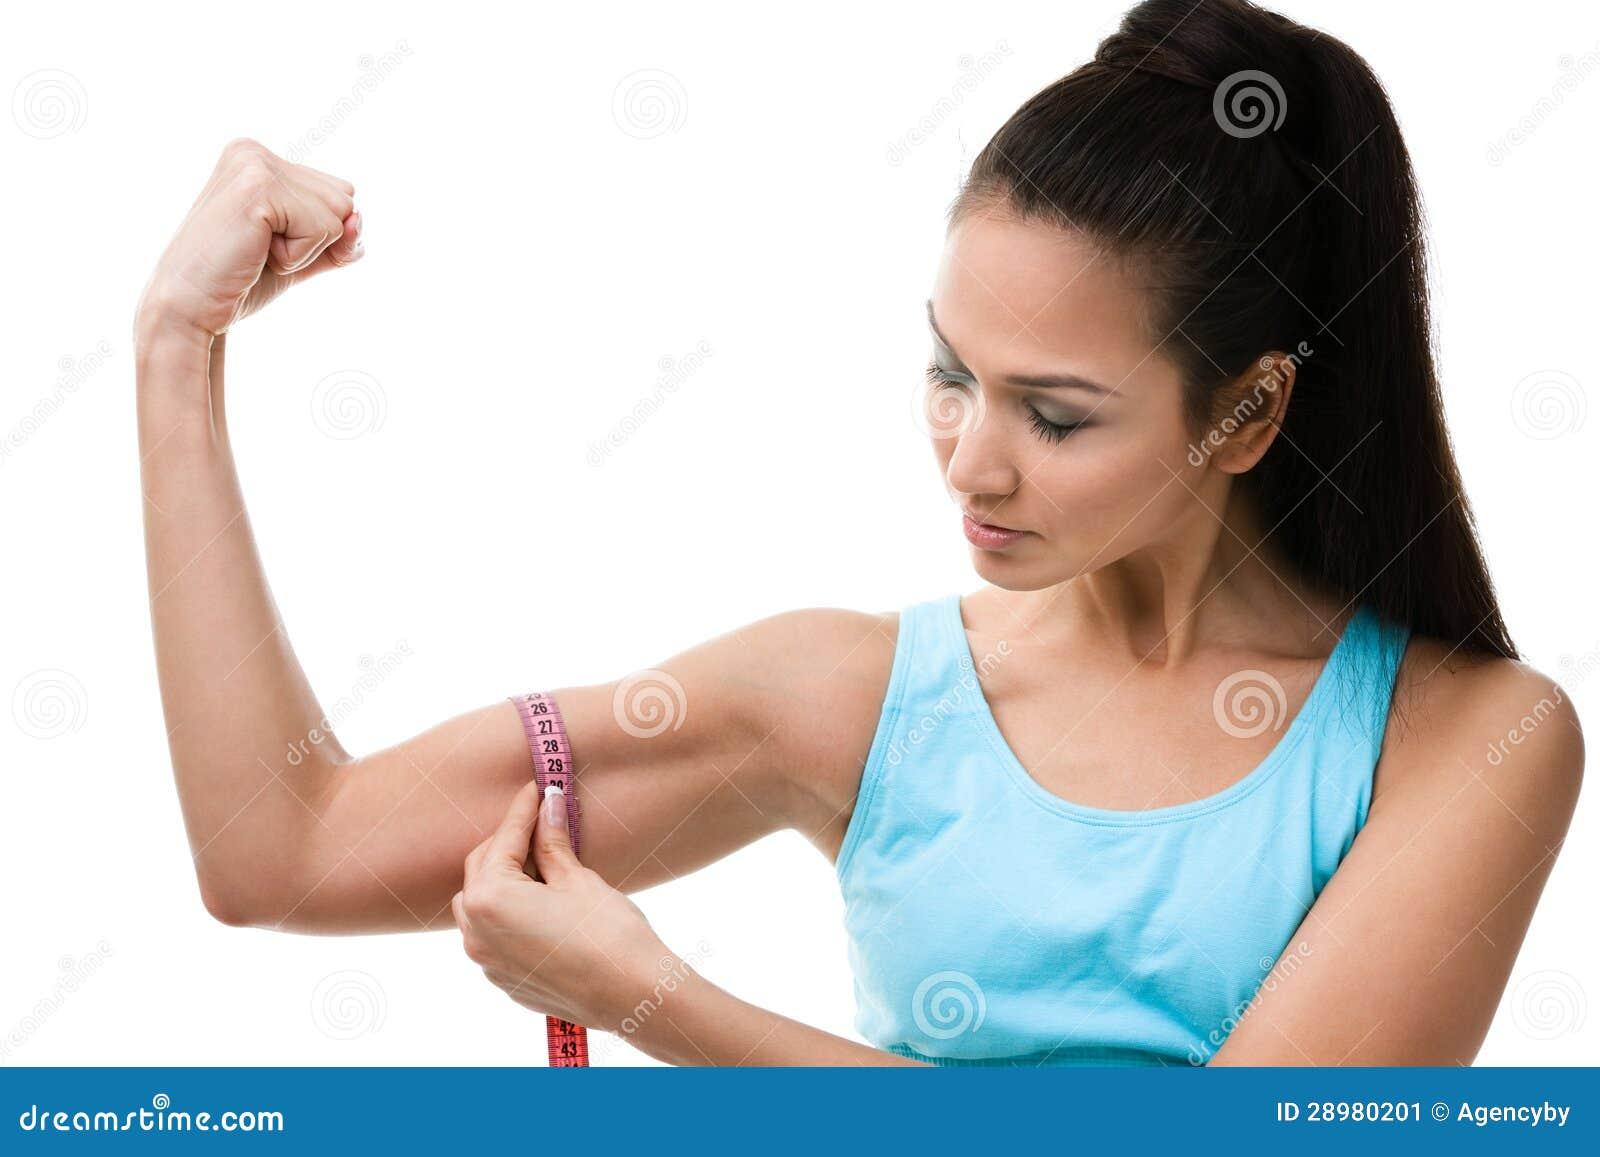 sportive woman measures her bicep stock image image 28980201. Black Bedroom Furniture Sets. Home Design Ideas